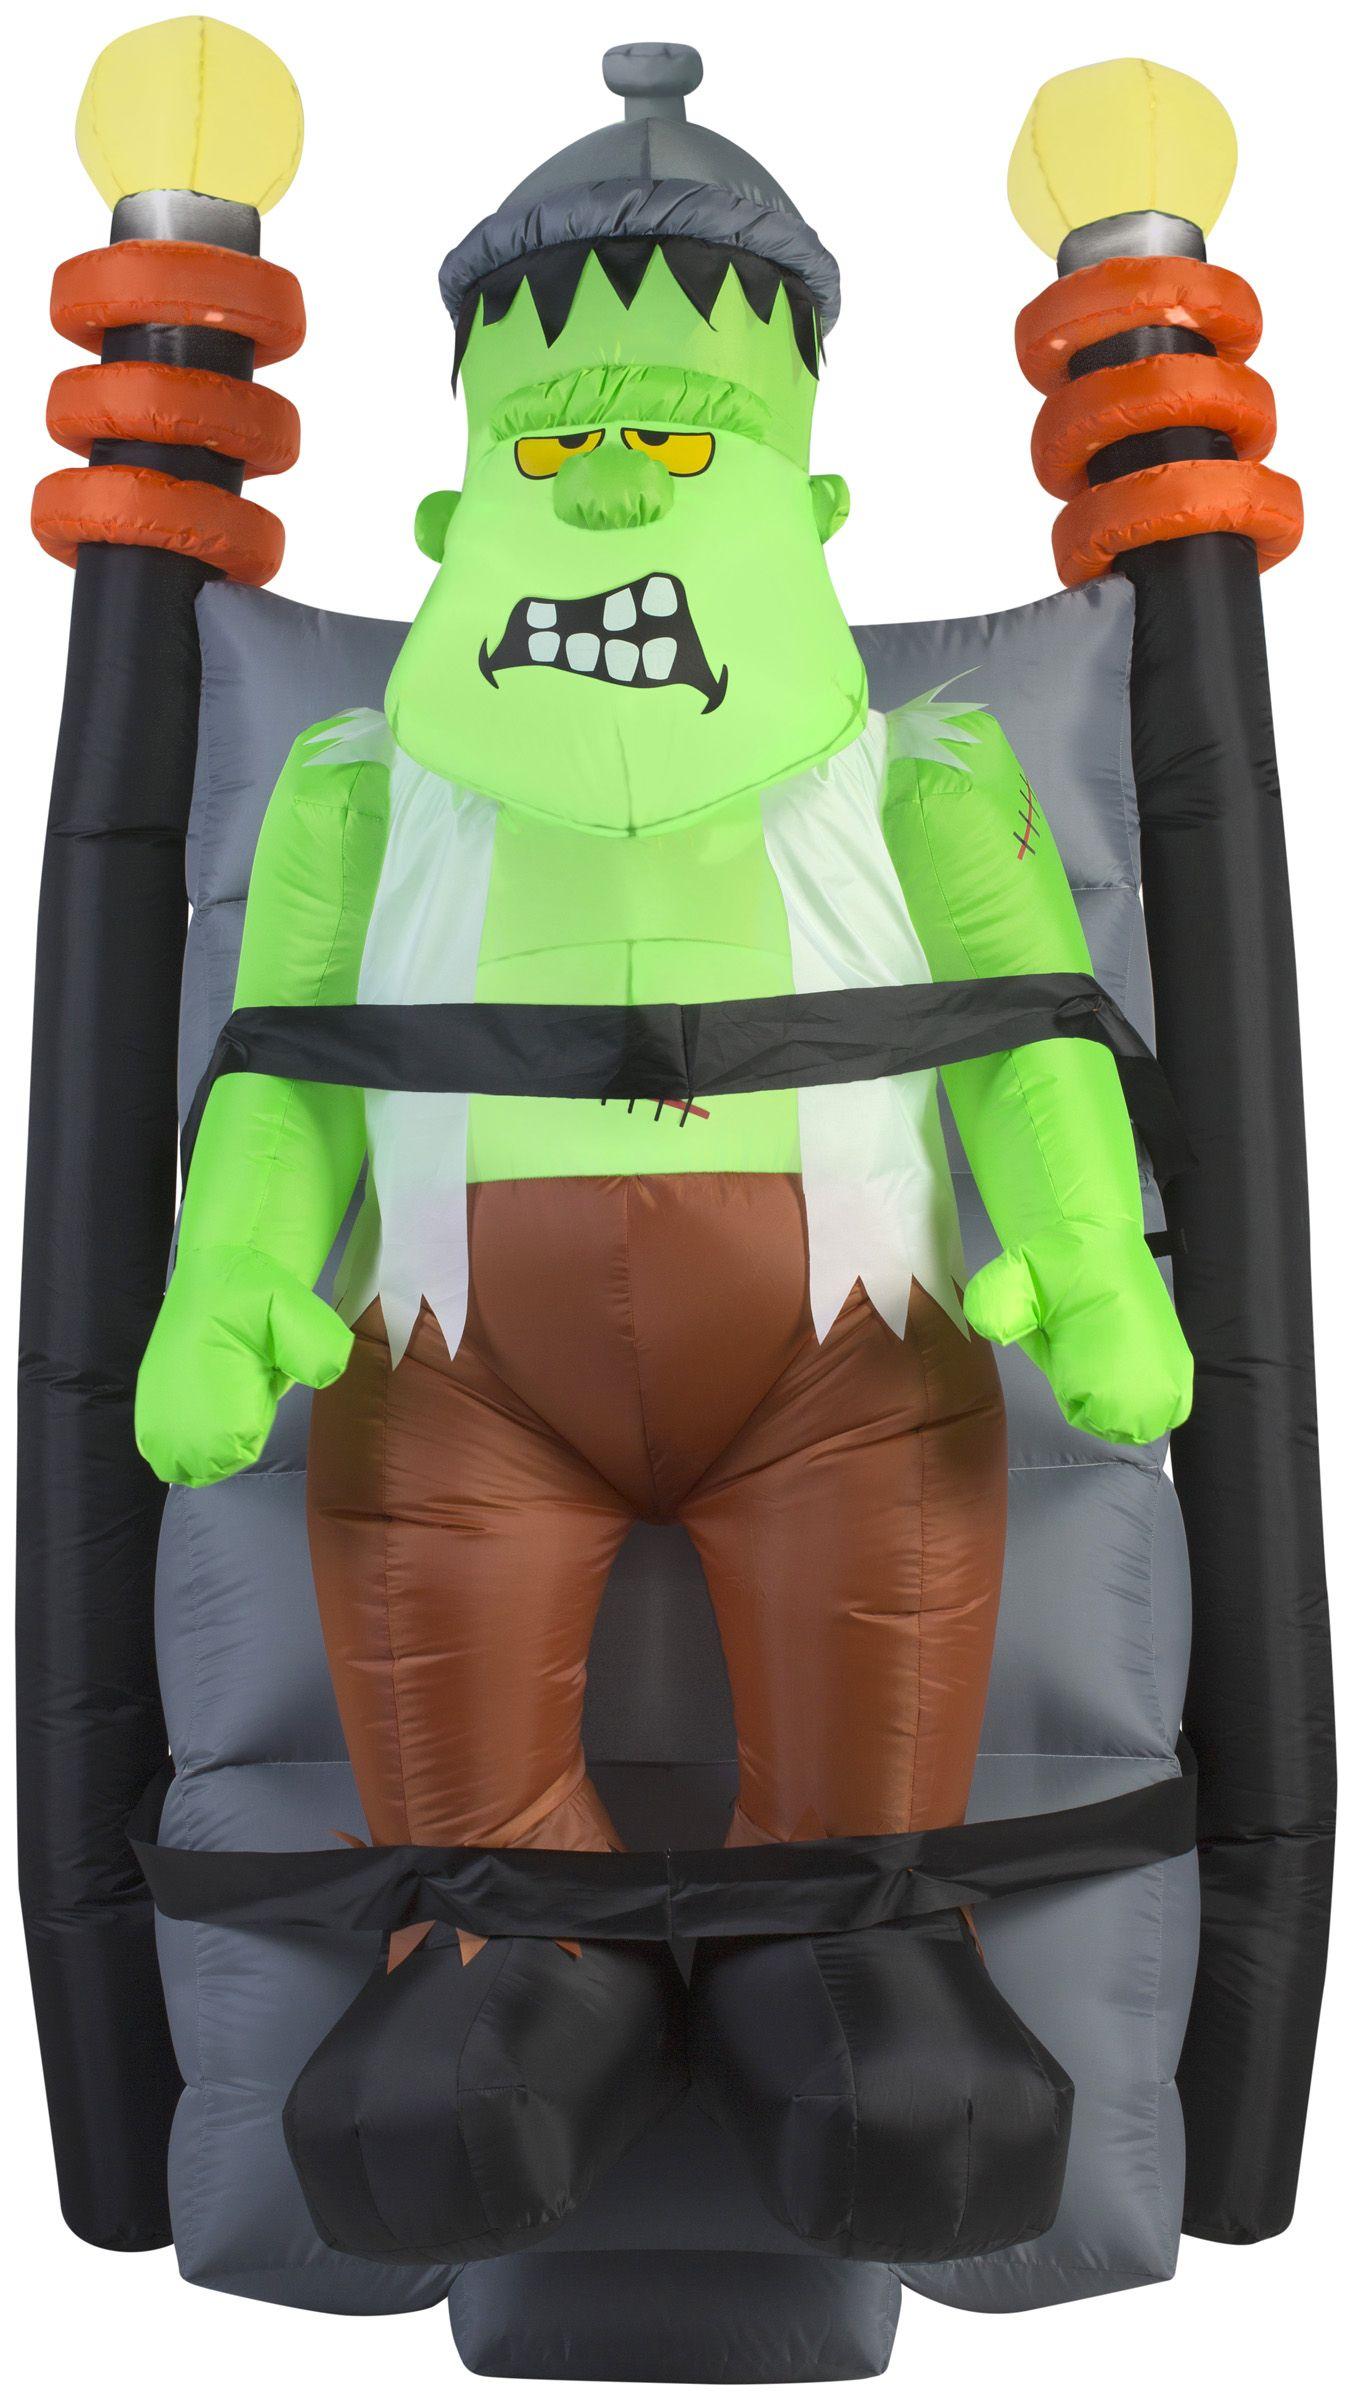 6 foot short circuit shaking monster halloween inflatable